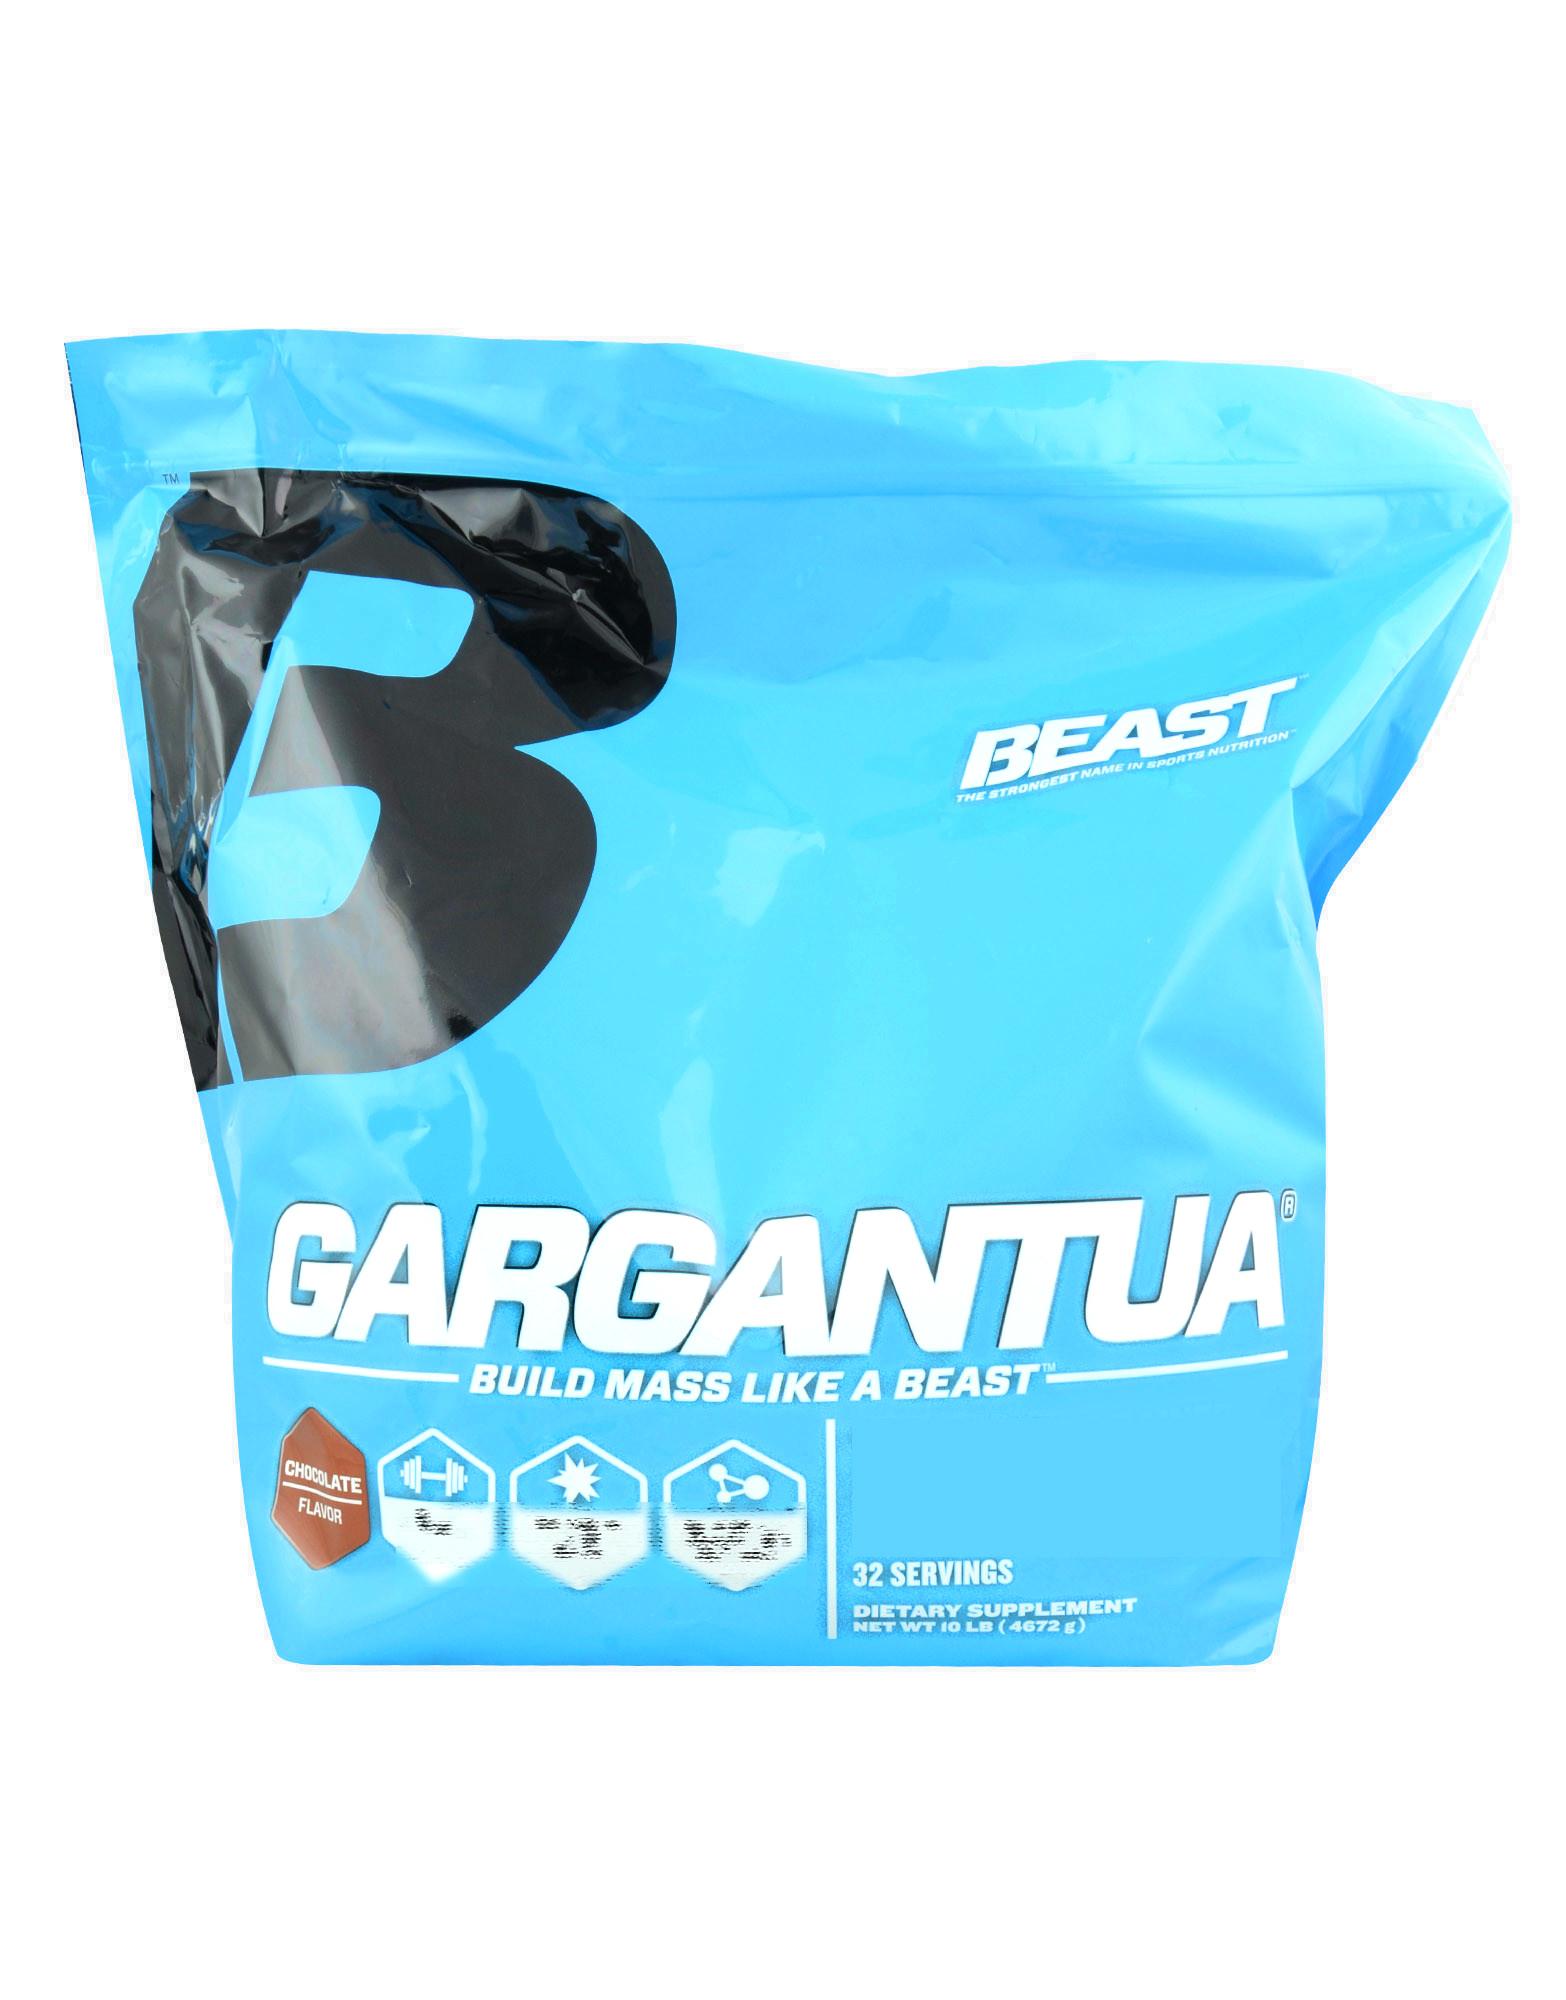 Gargantua by BEAST (4672 grams) fddbede108